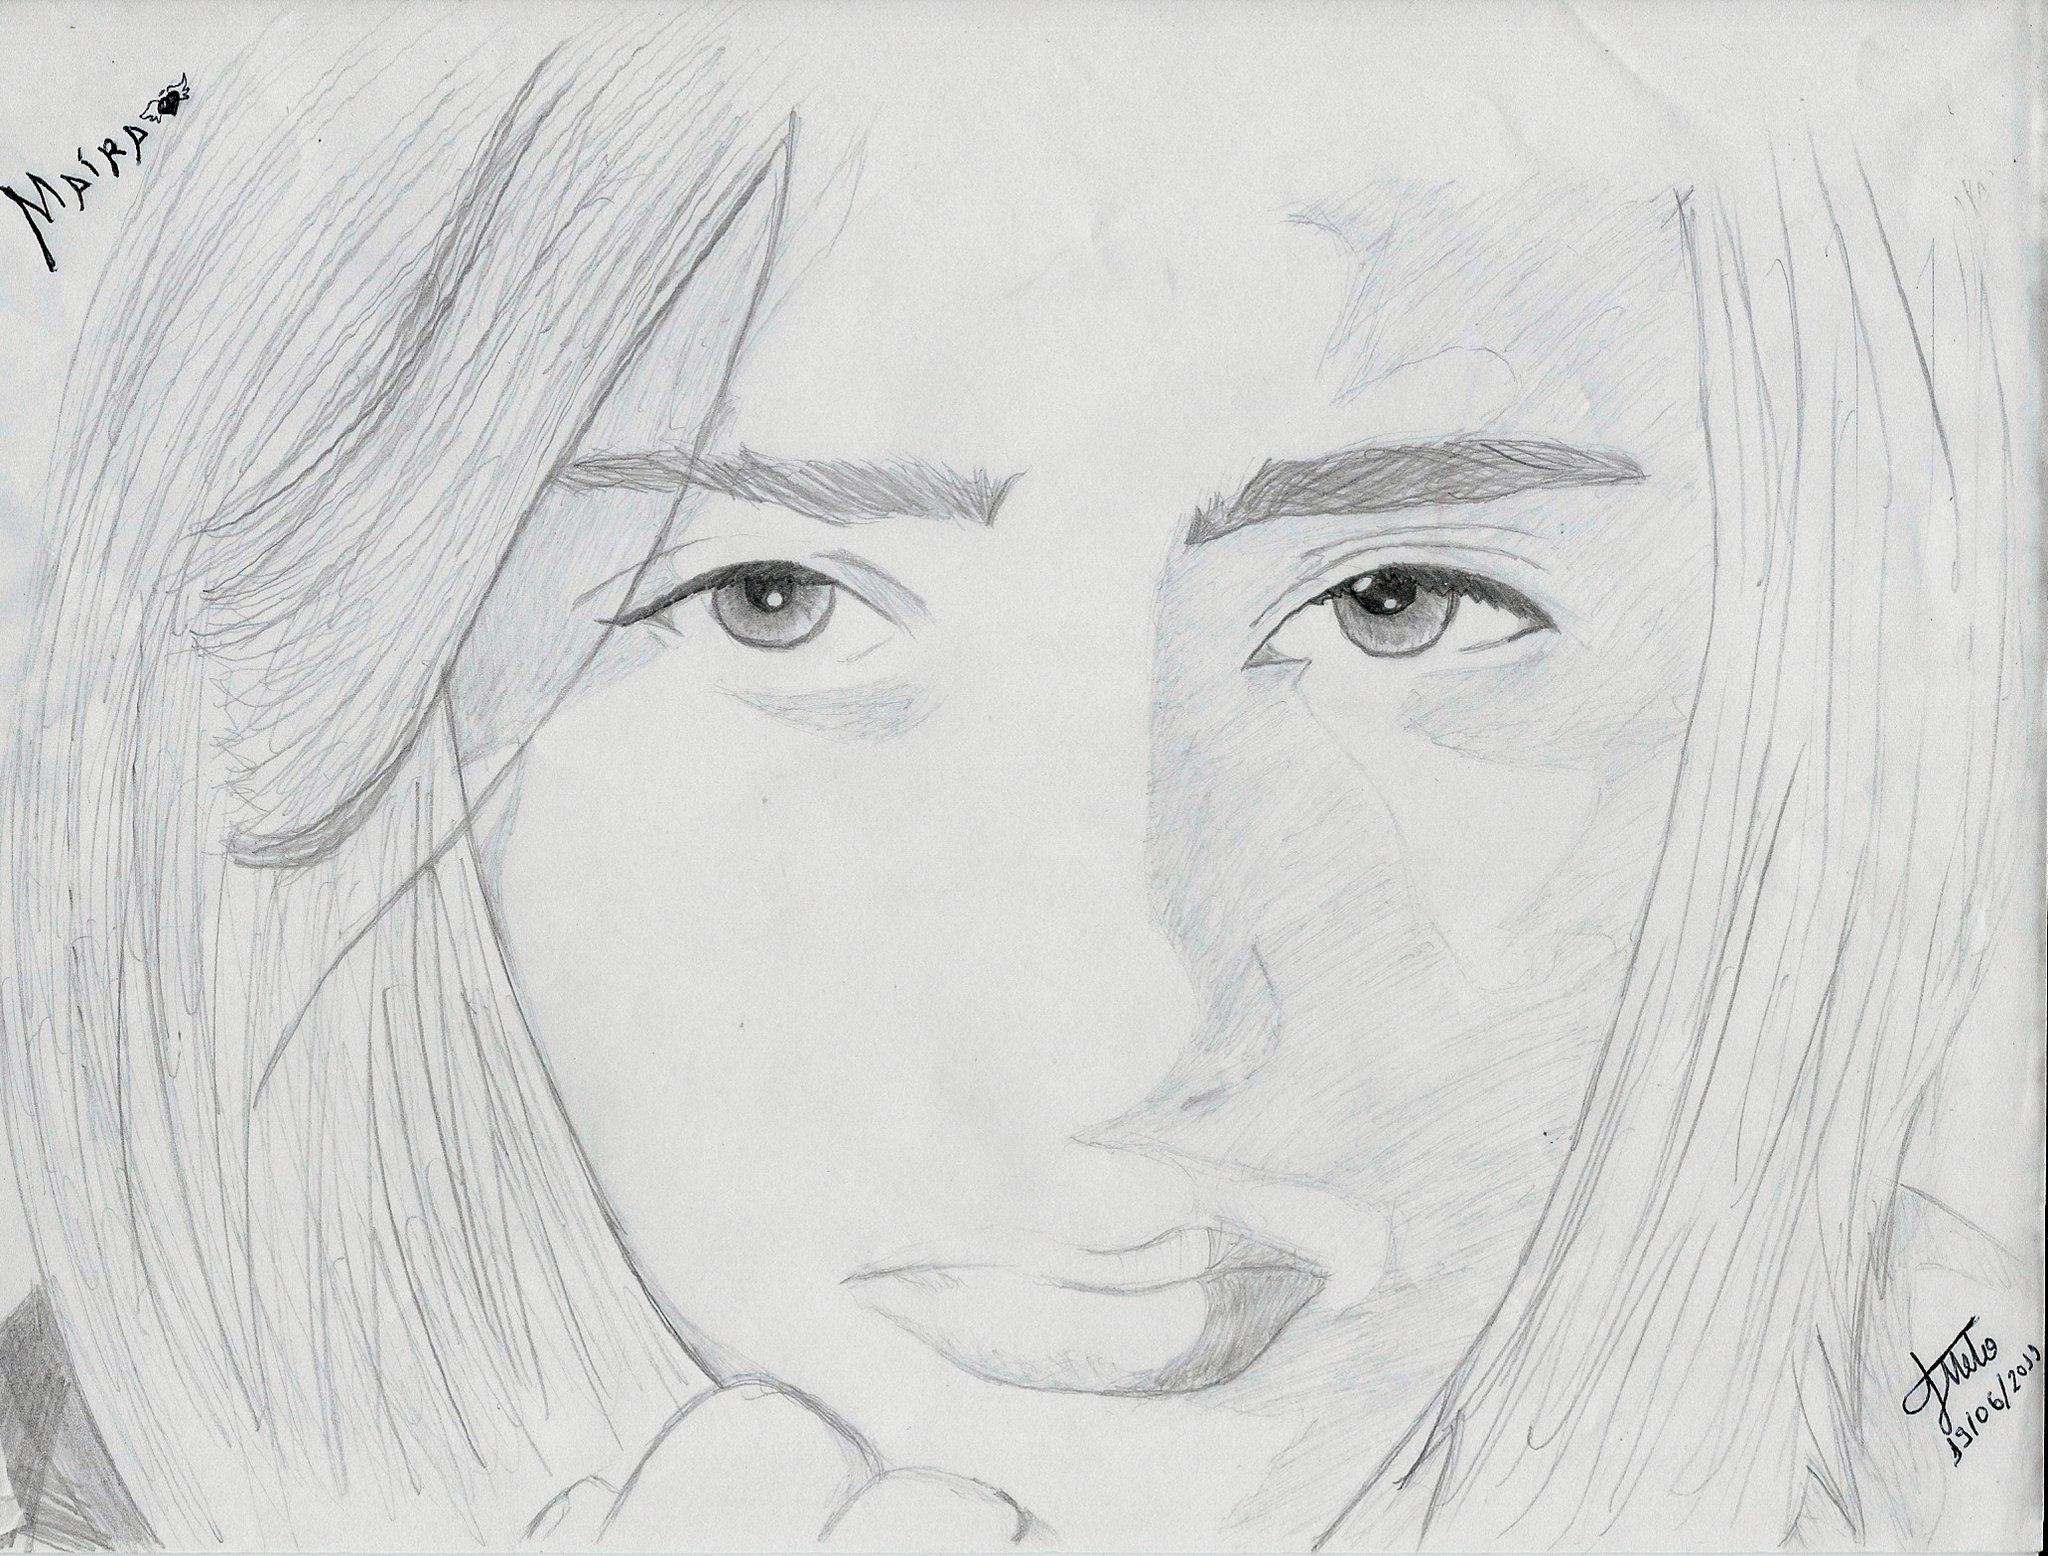 Maira by Gurock